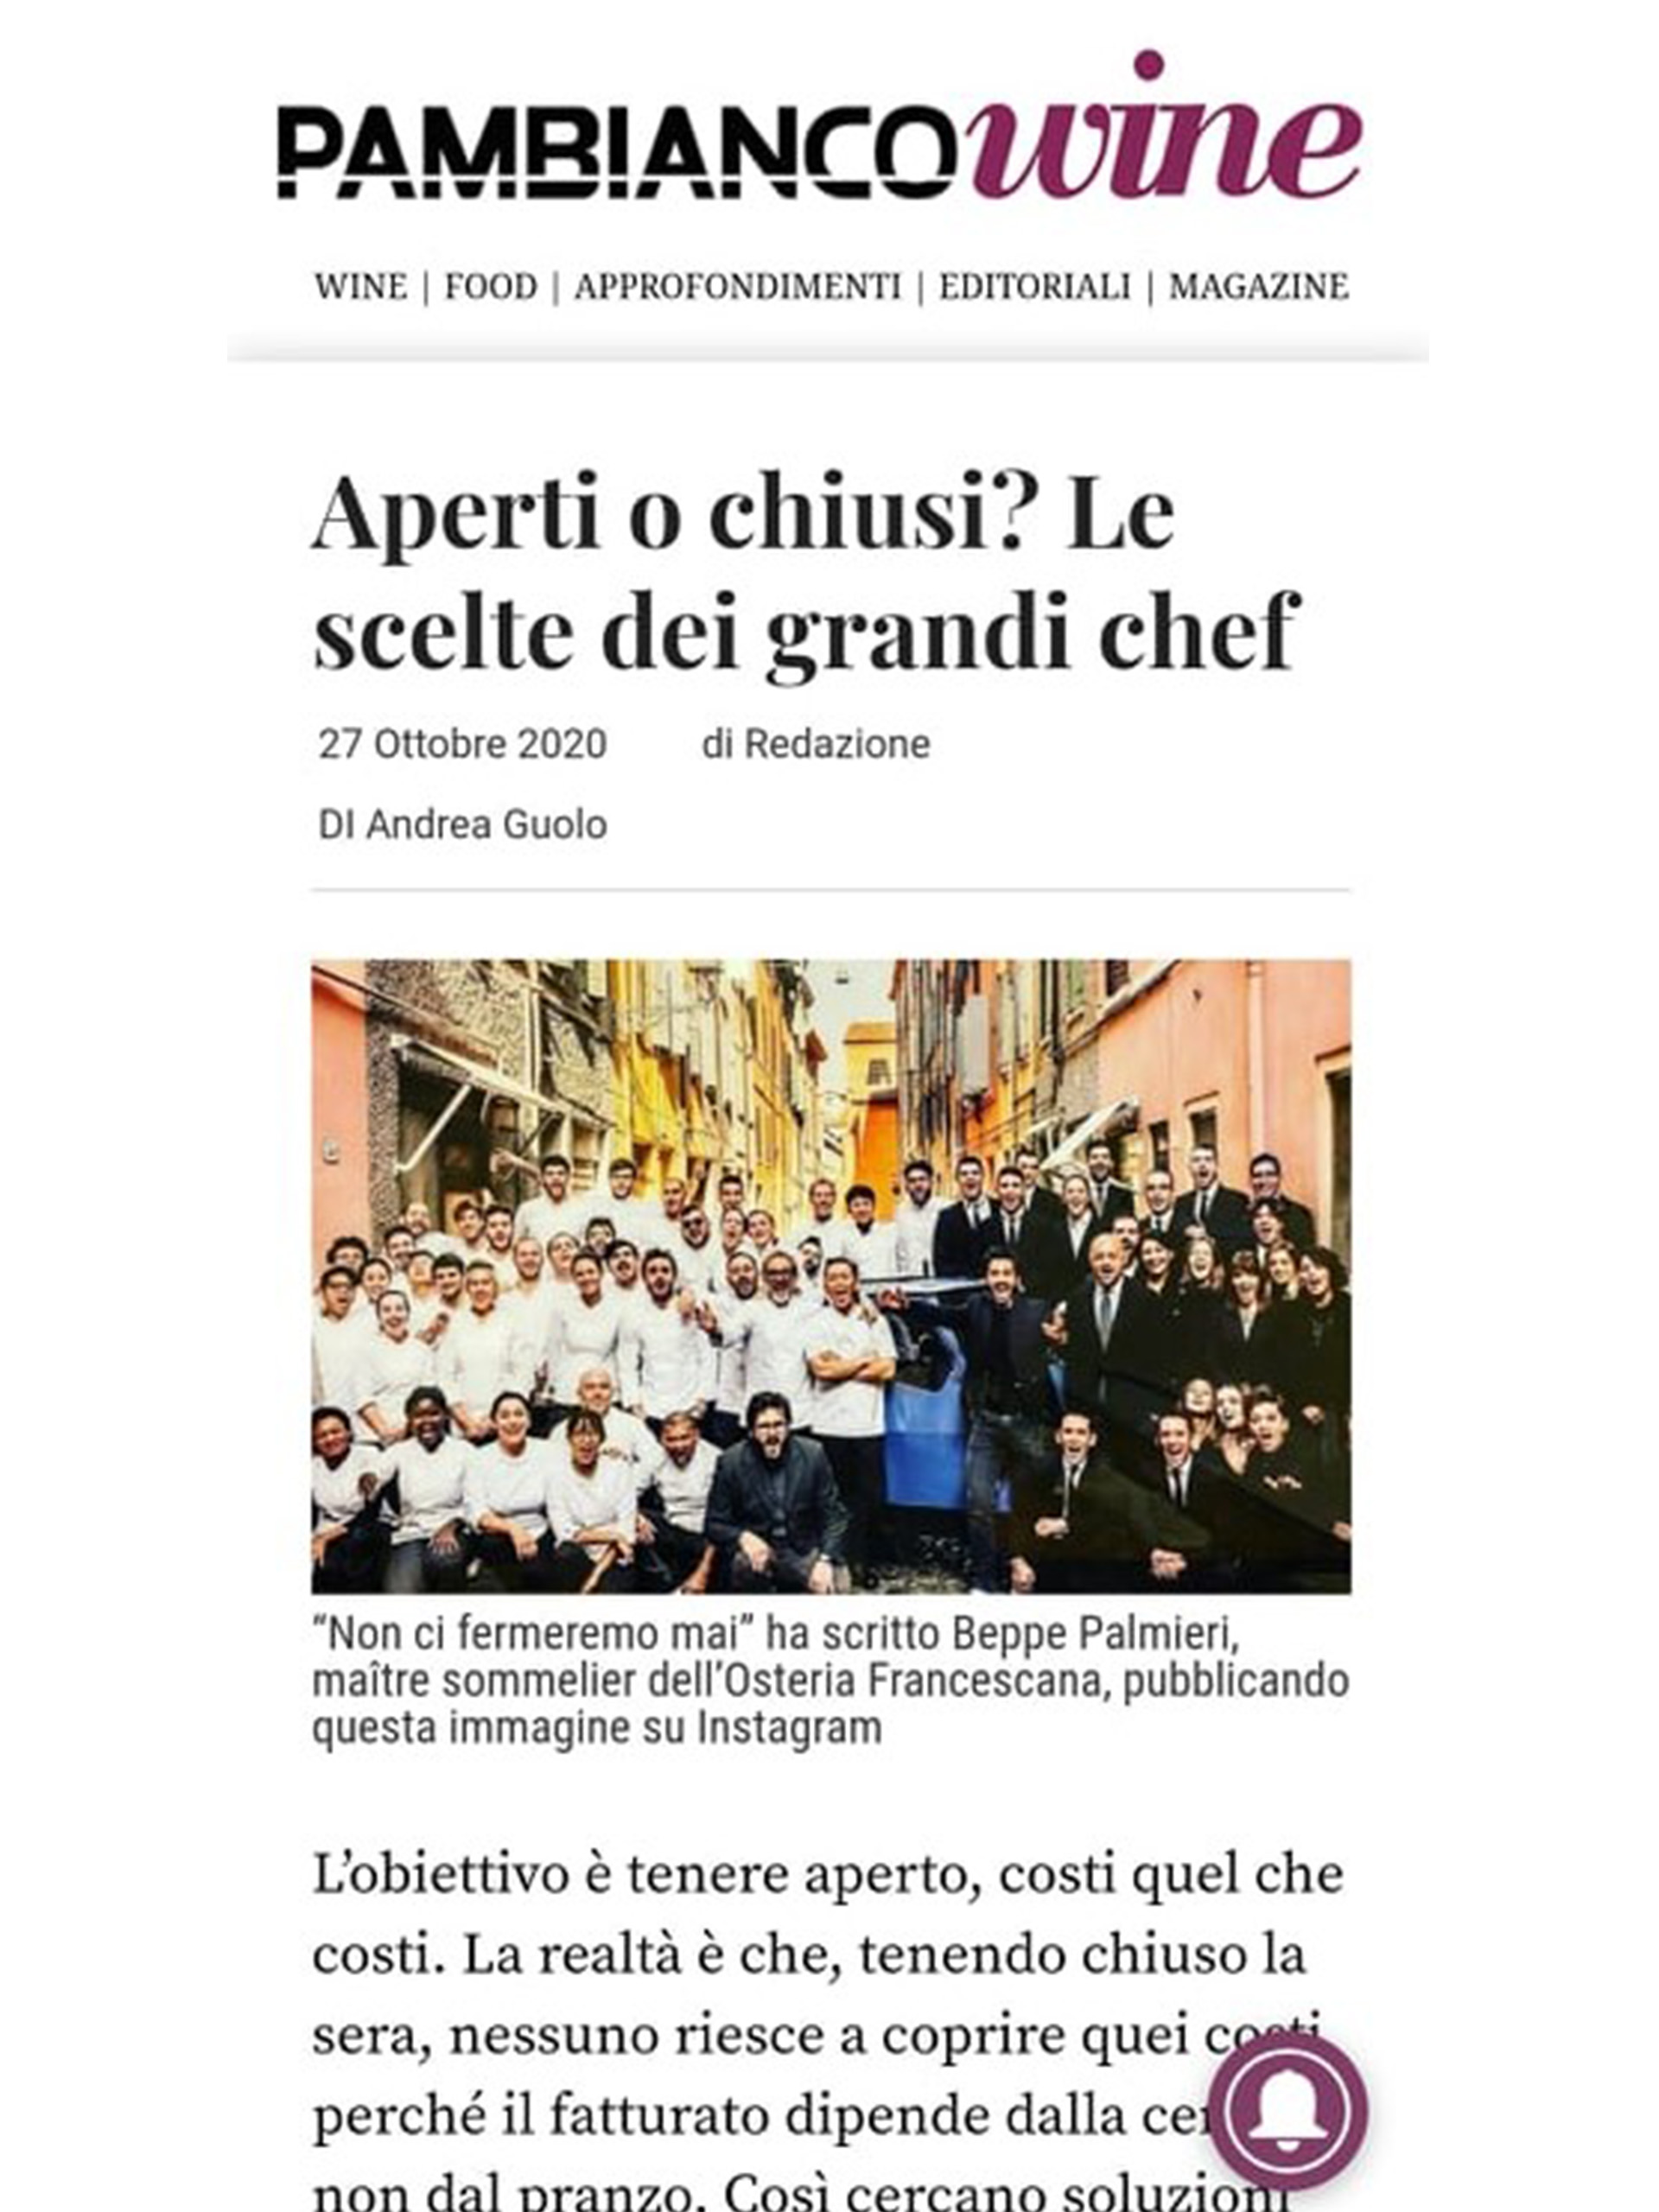 Arnolfo – Pambianco – Ottobre 2020